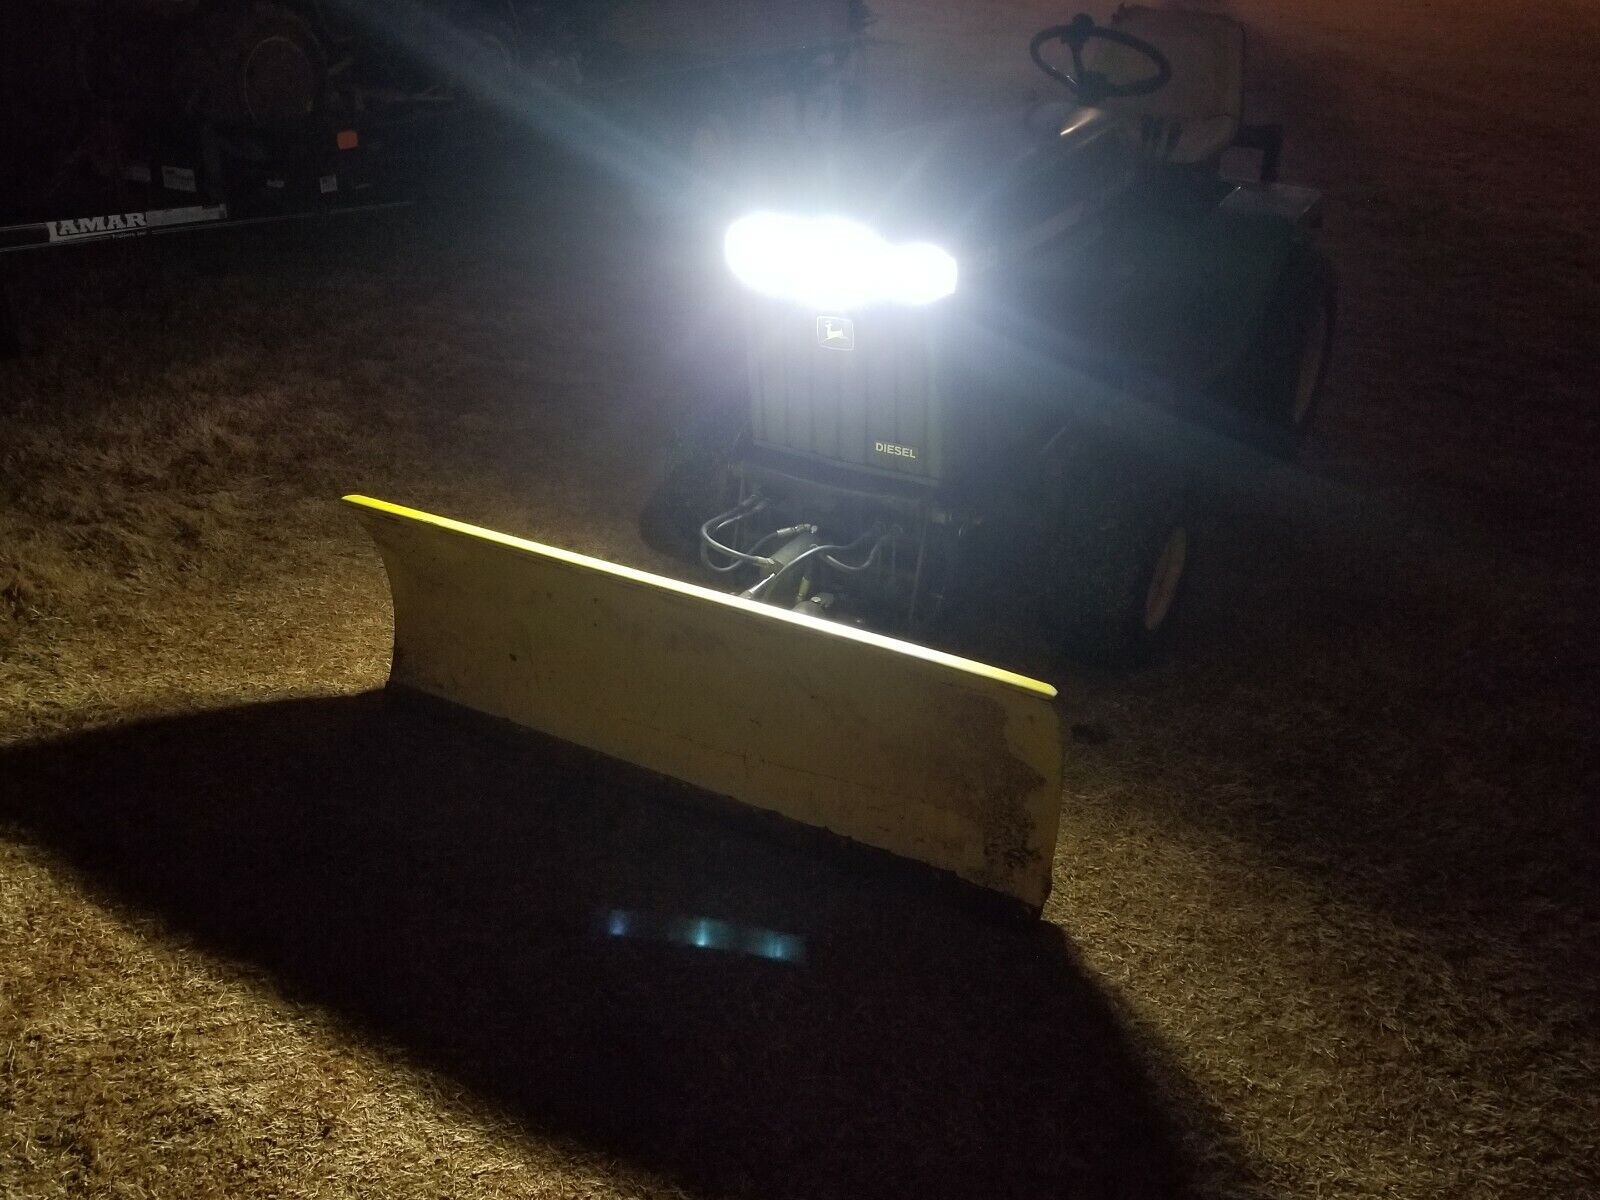 2 SUPER BRIGHT LED light bulbs Kubota older style lights pn 31391-34360 tractor